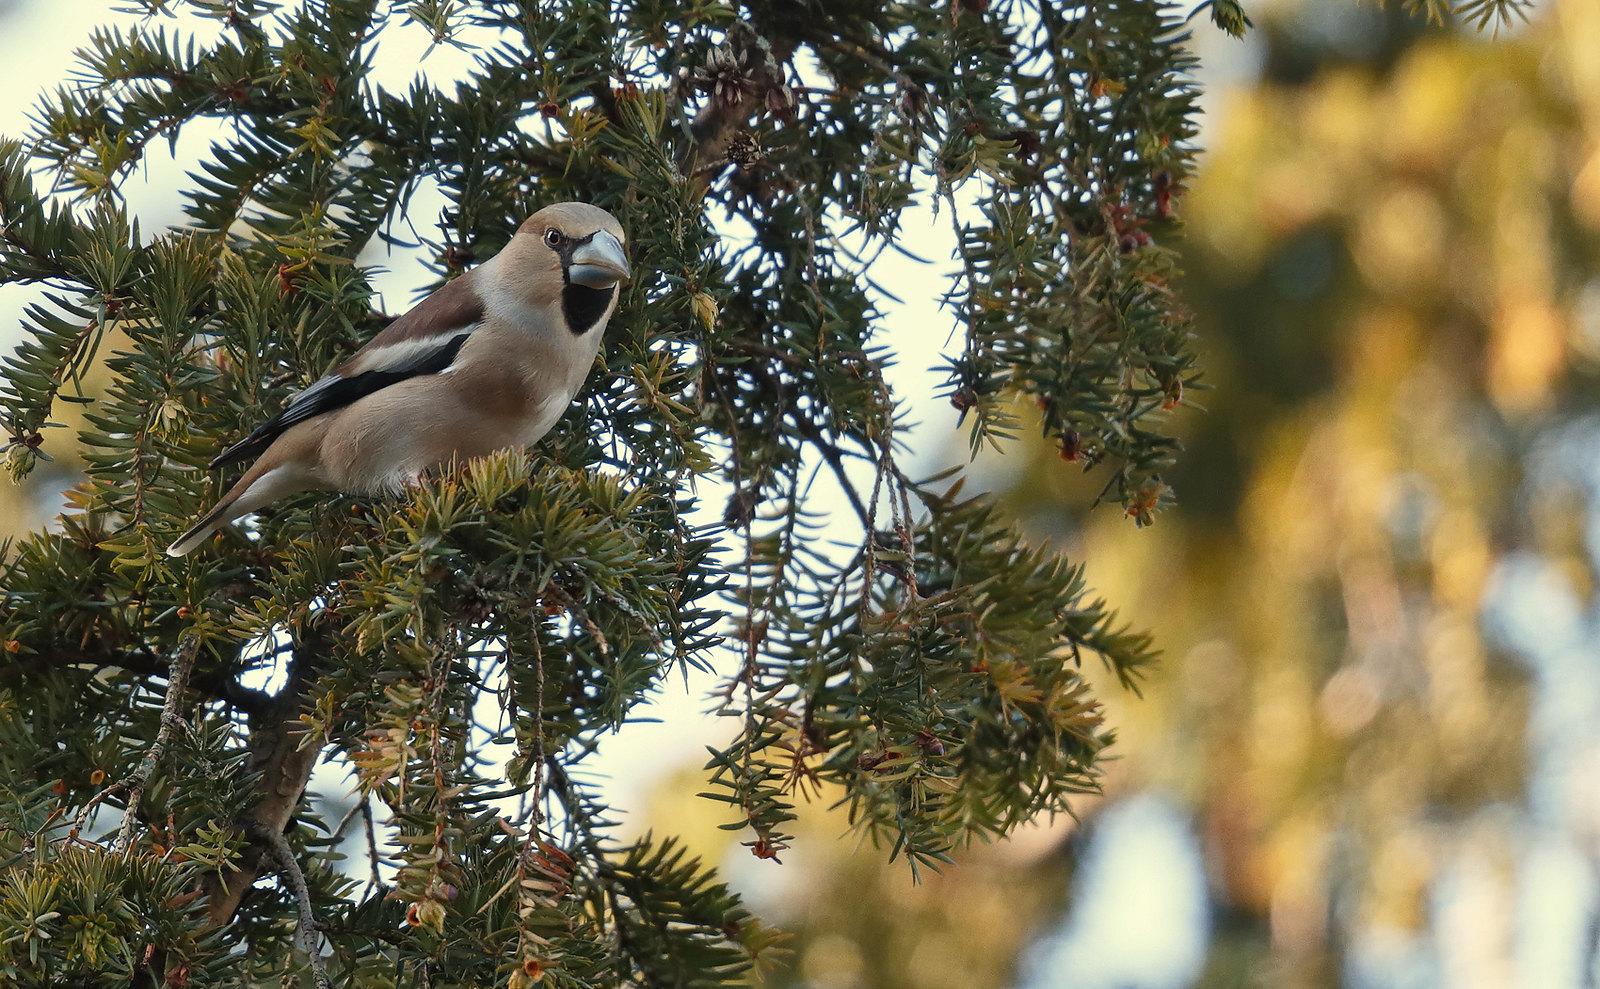 Hawfinch - Darley Dale, Matlock